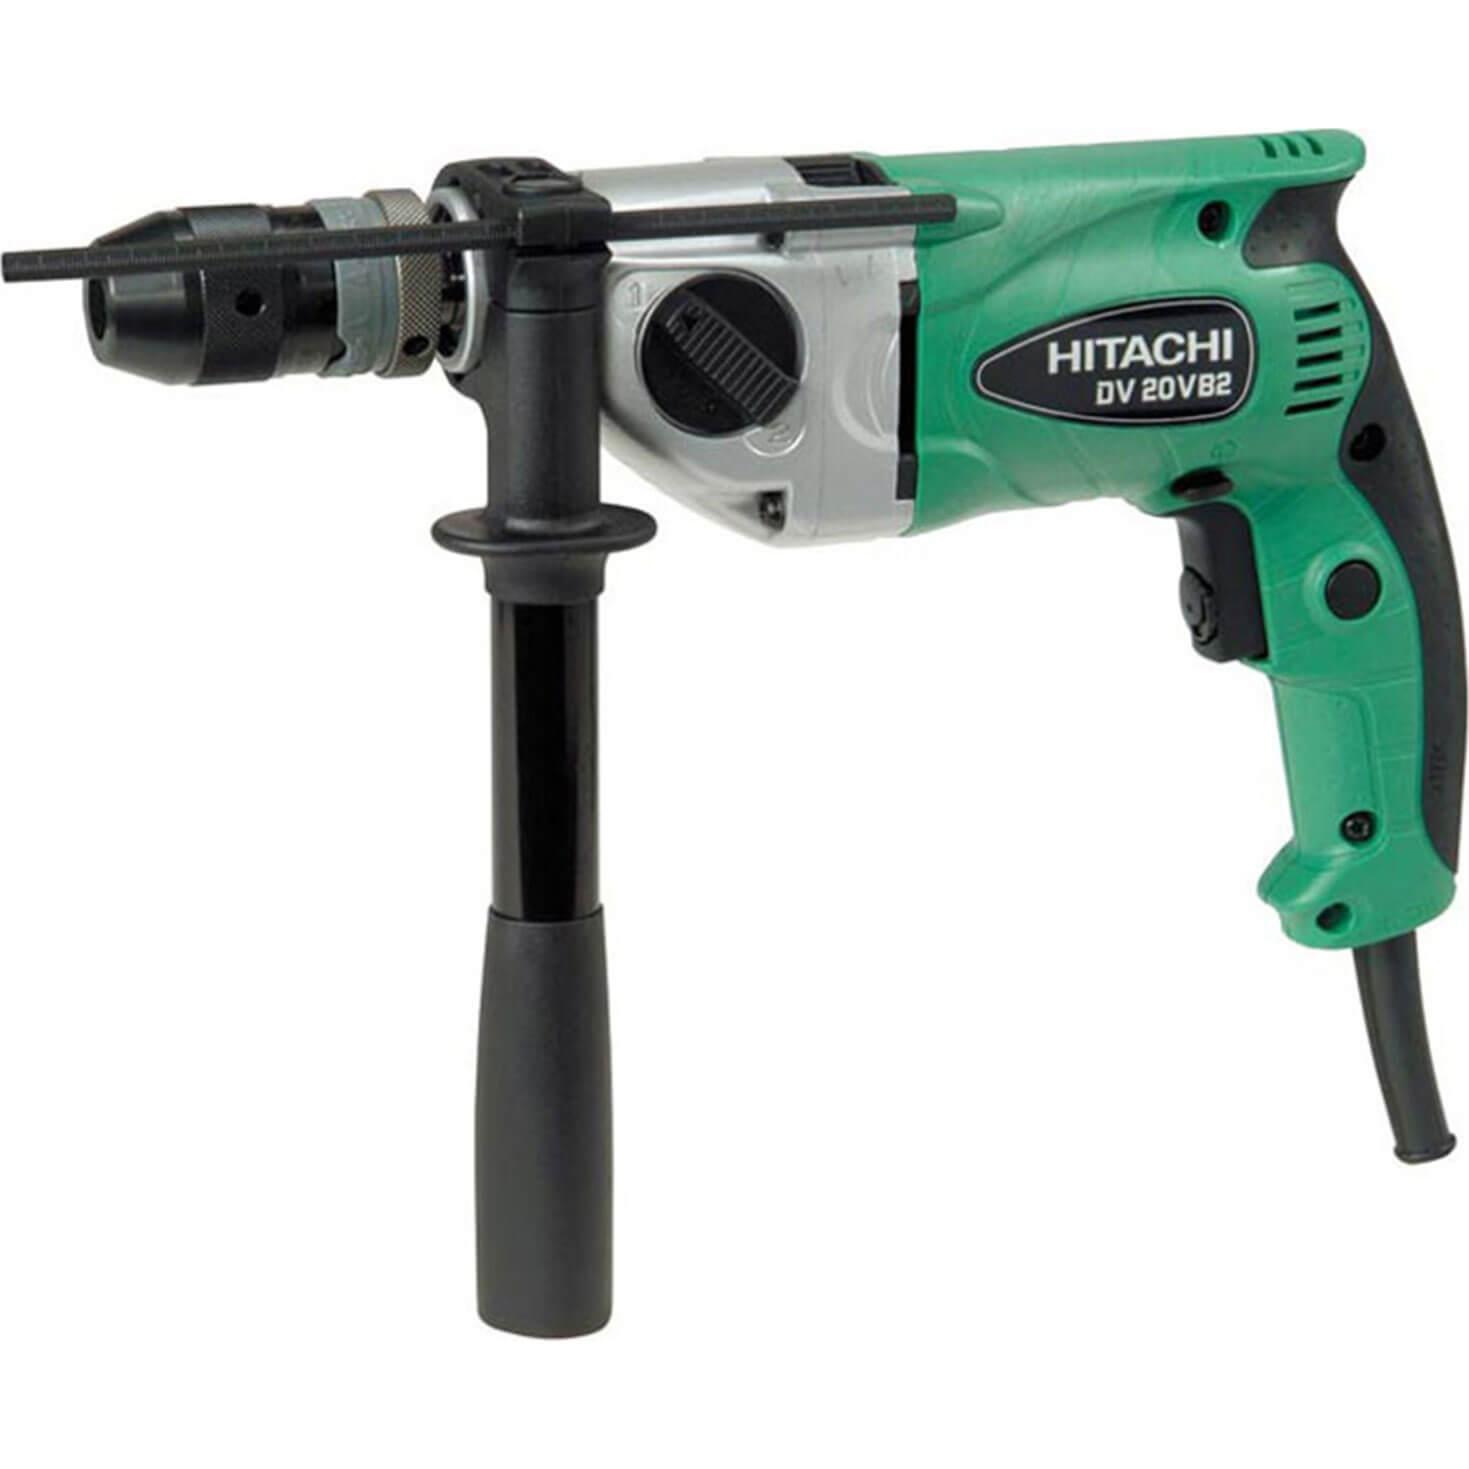 Hitachi Dv20vb2 Hammer Drill 790w 110v